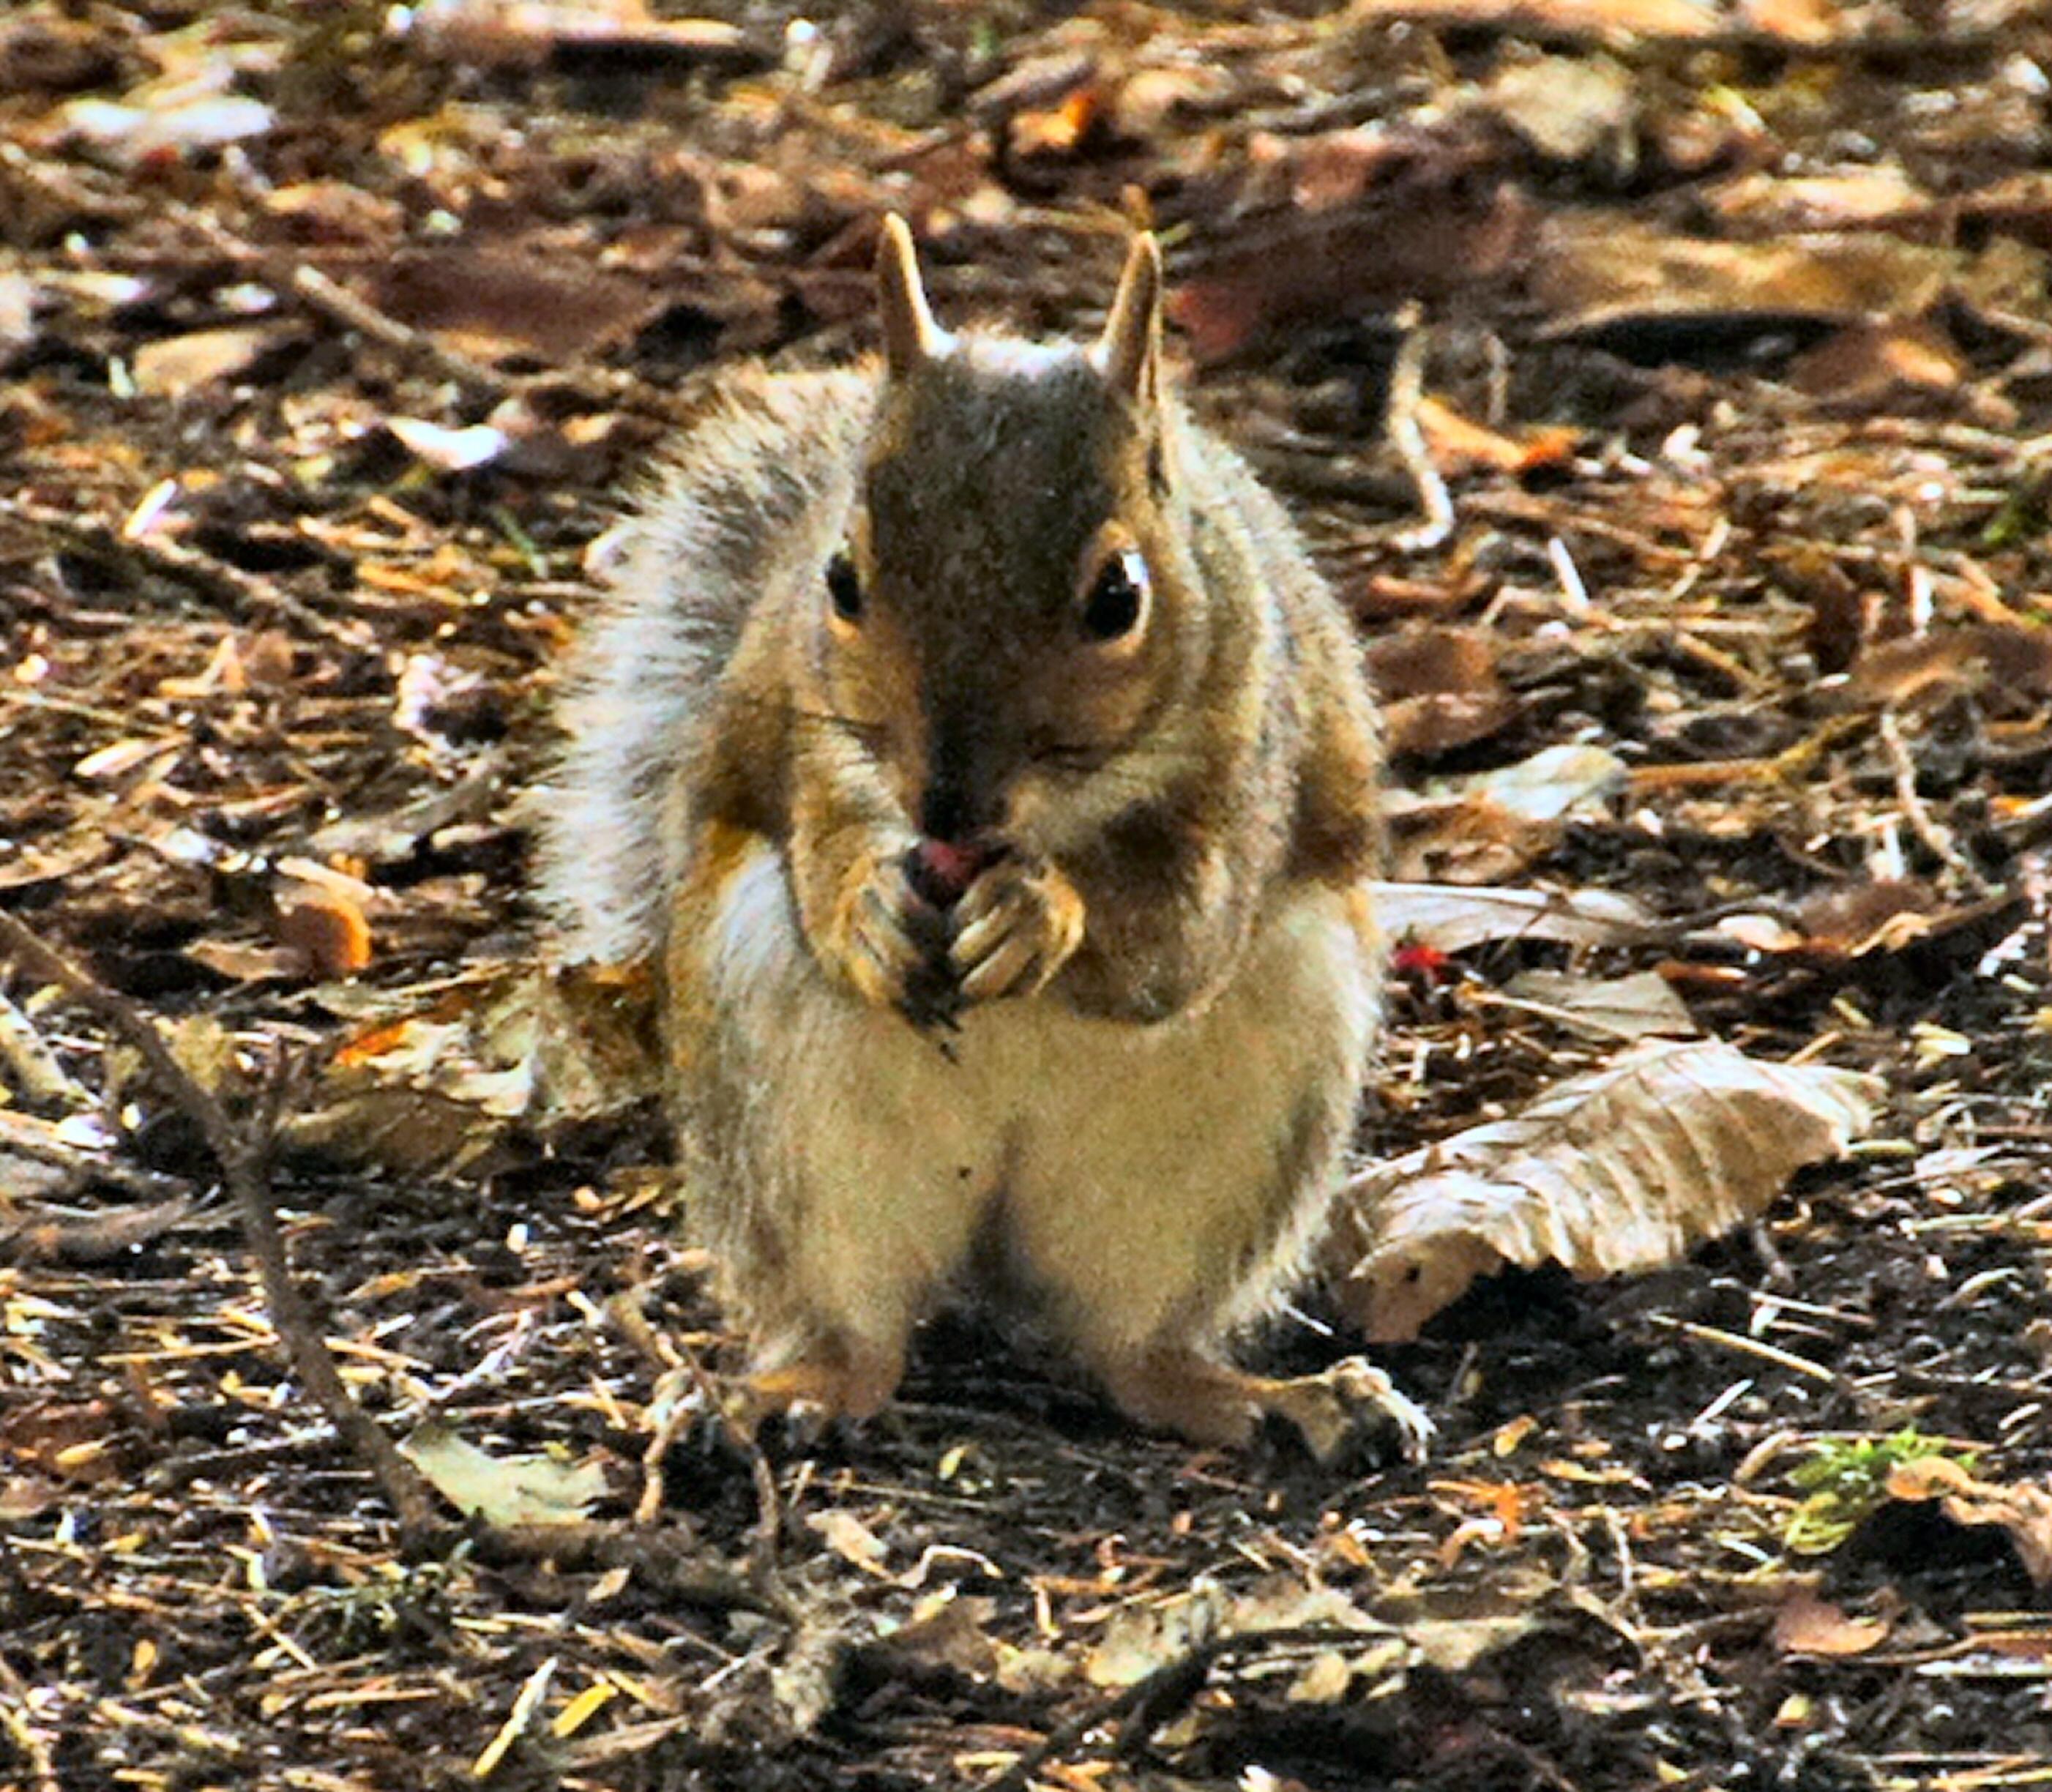 Squirrels14-07-11--14072011027-sized